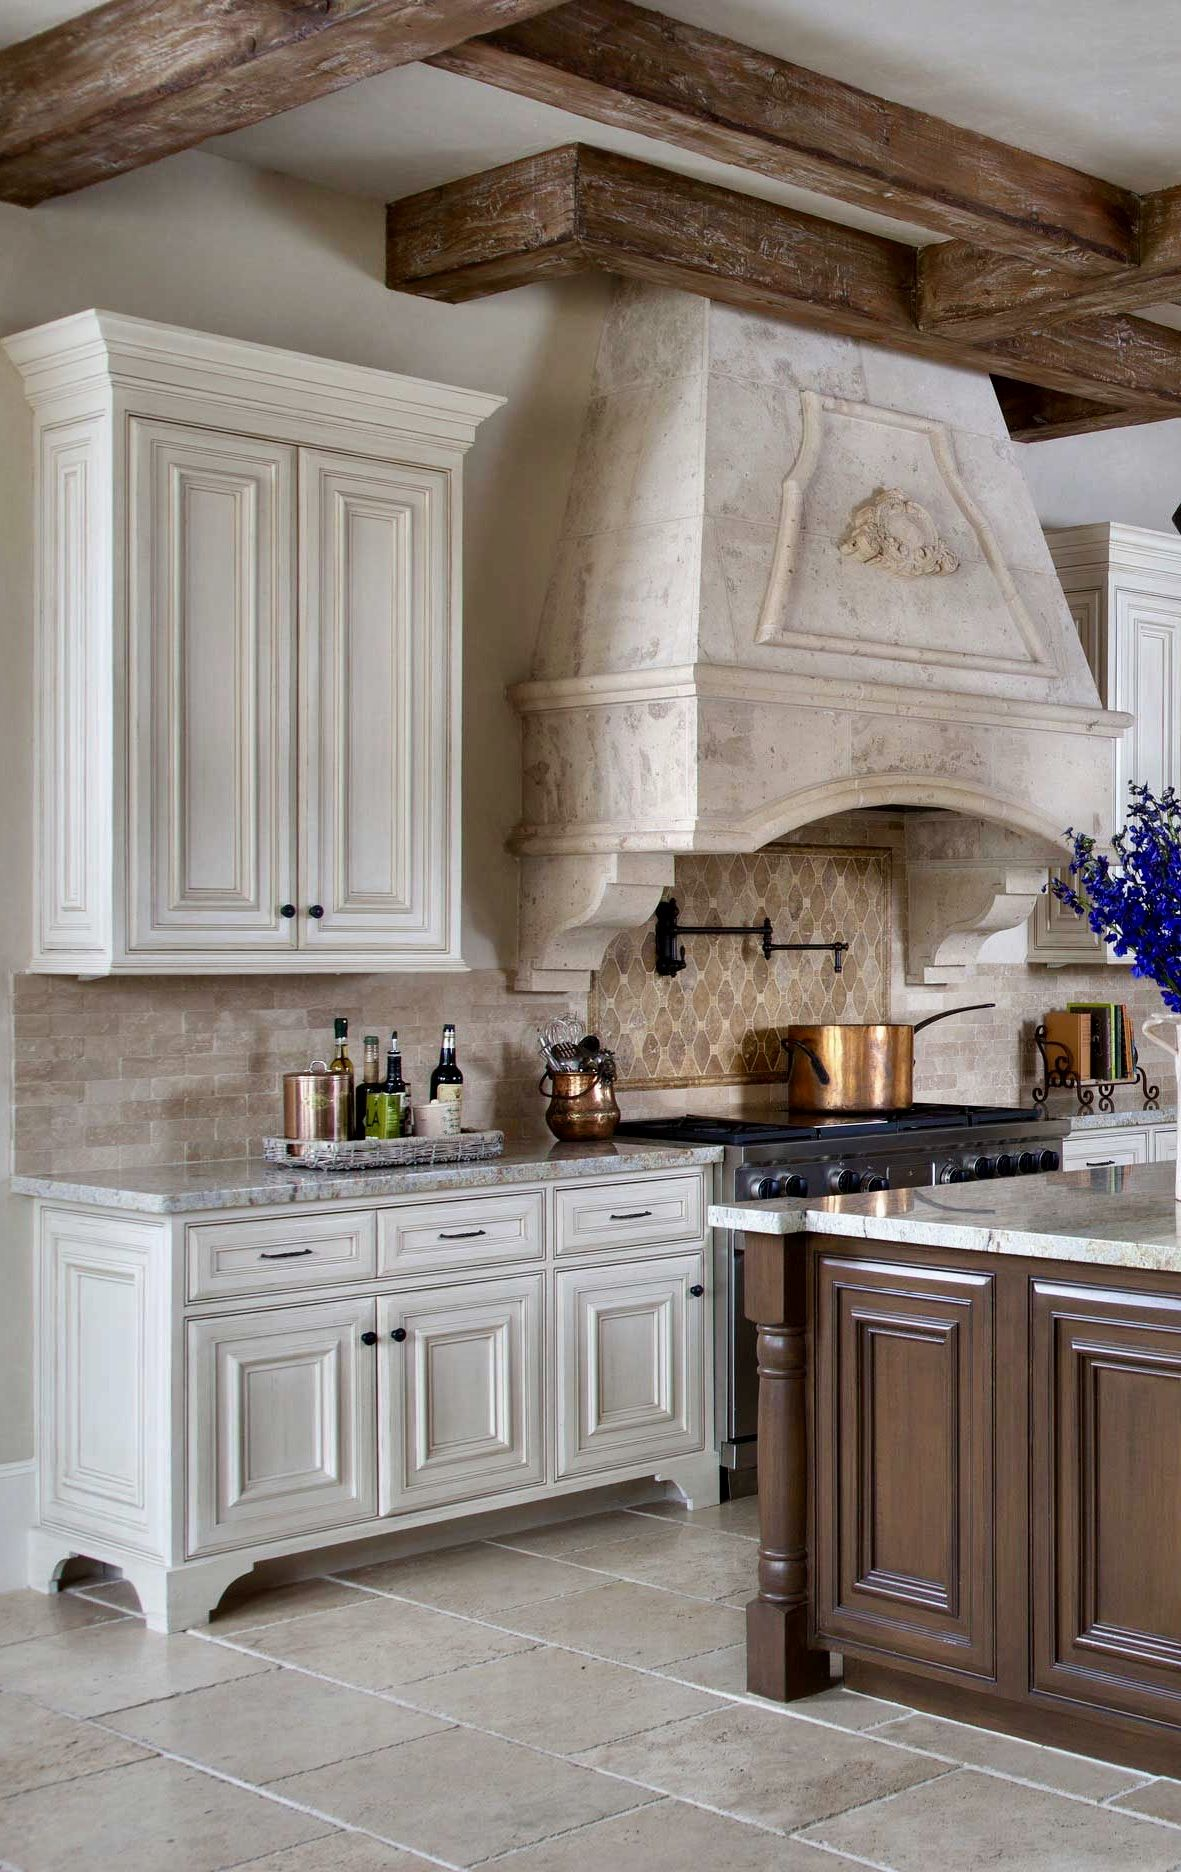 Pin On Old World Mediterranean Italian Spanish Tuscan Homes Design Decor